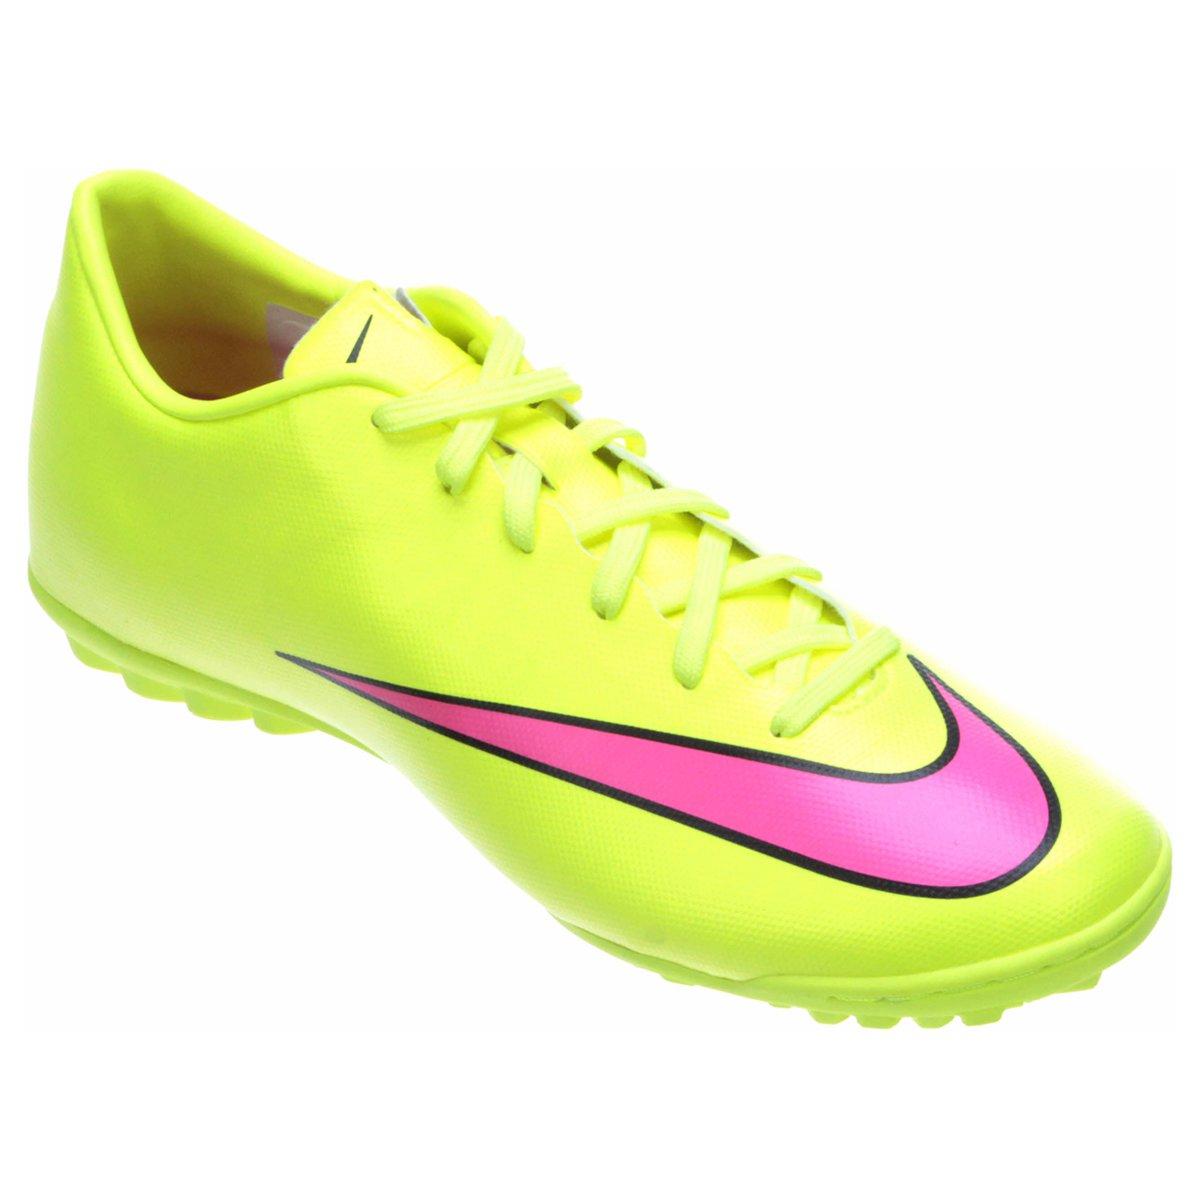 631d05df61 Chuteira Society Nike Mercurial Victory 5 TF - Compre Agora